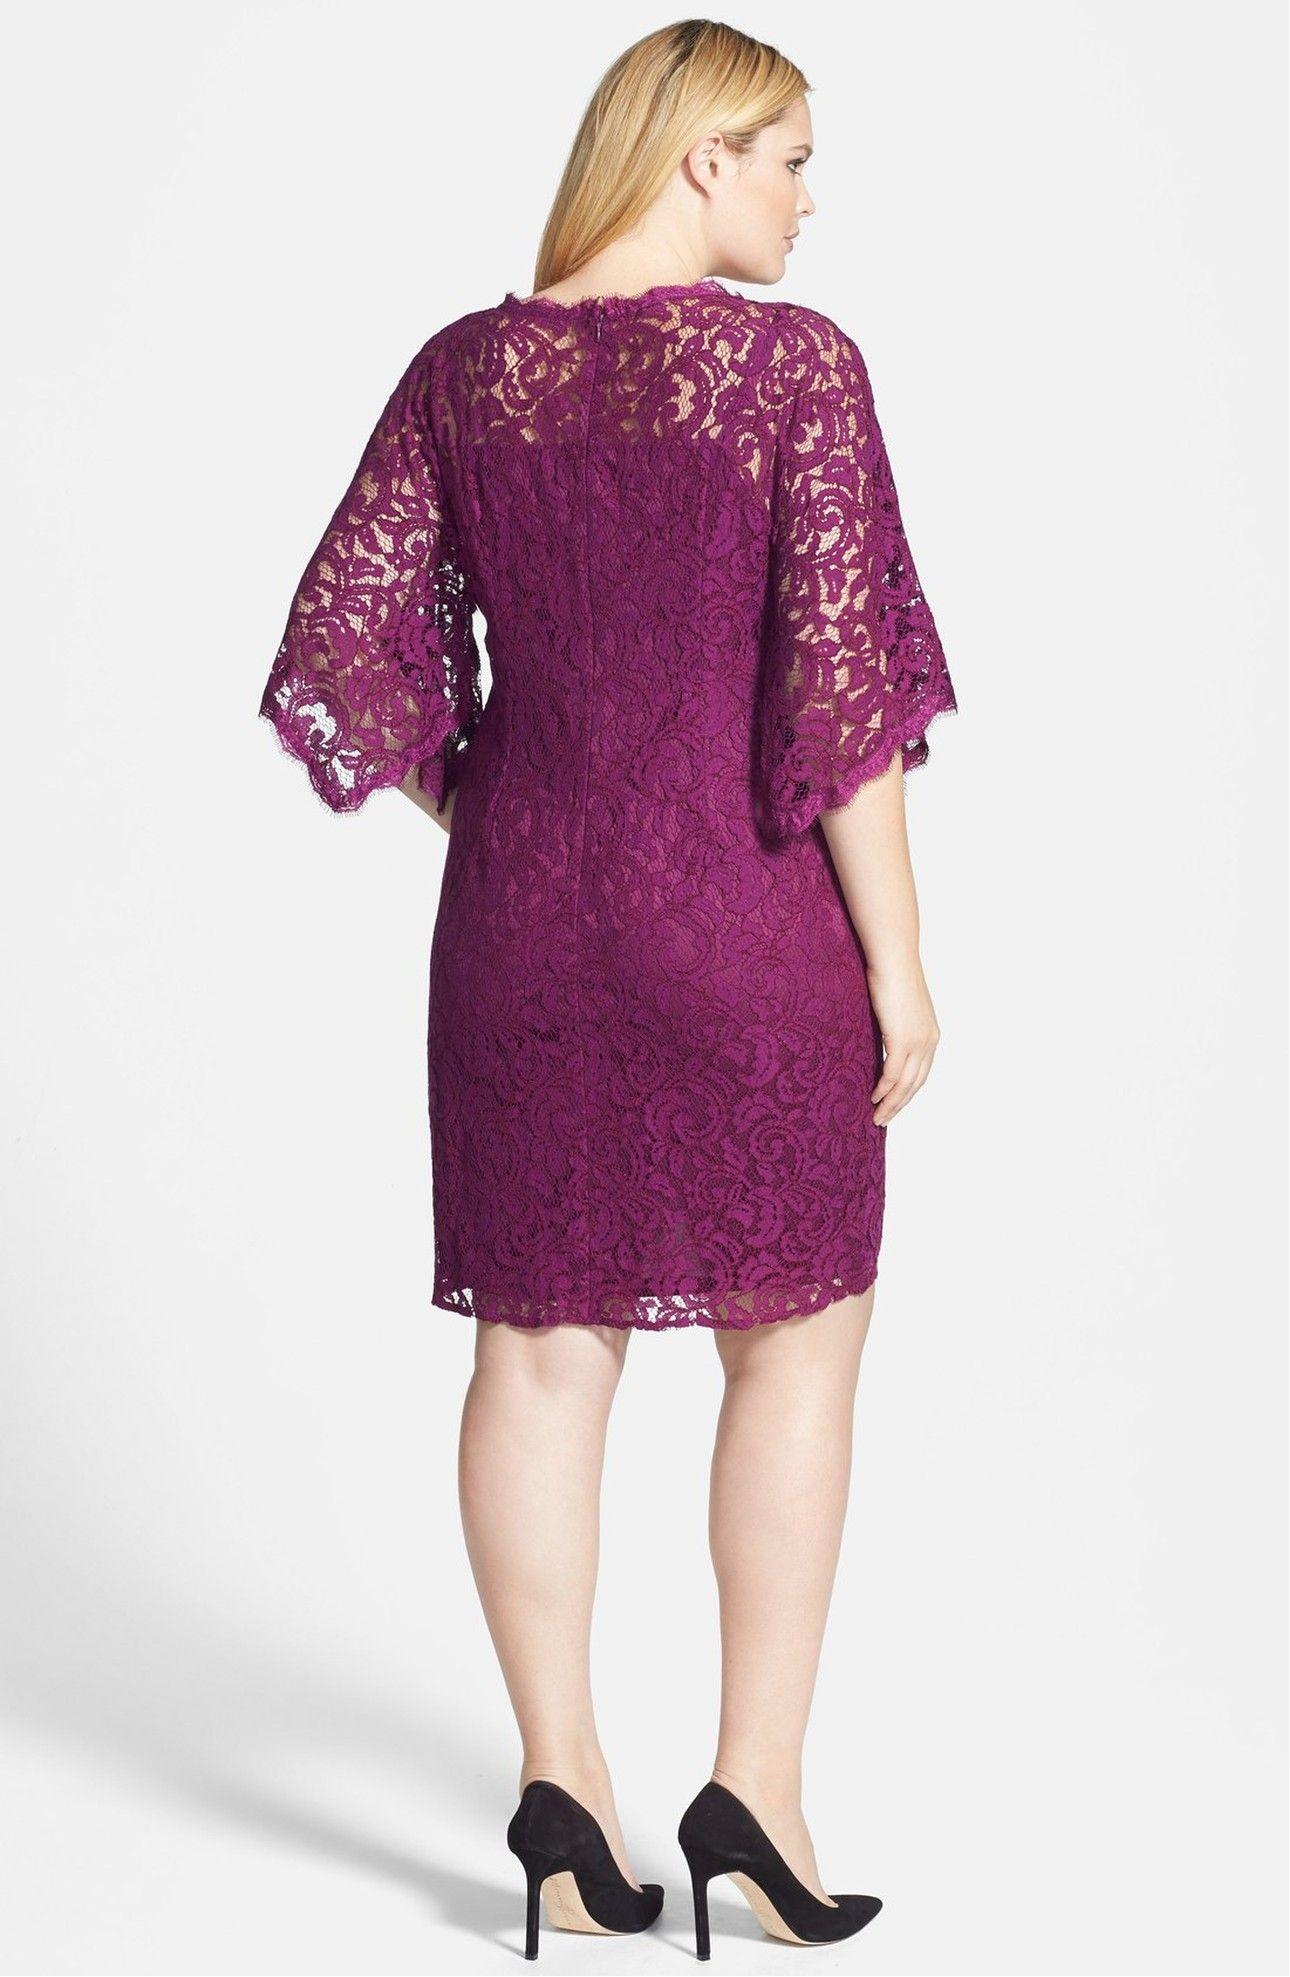 Product Image 2 | fashion | Pinterest | Blusas en encaje, Blusas y ...